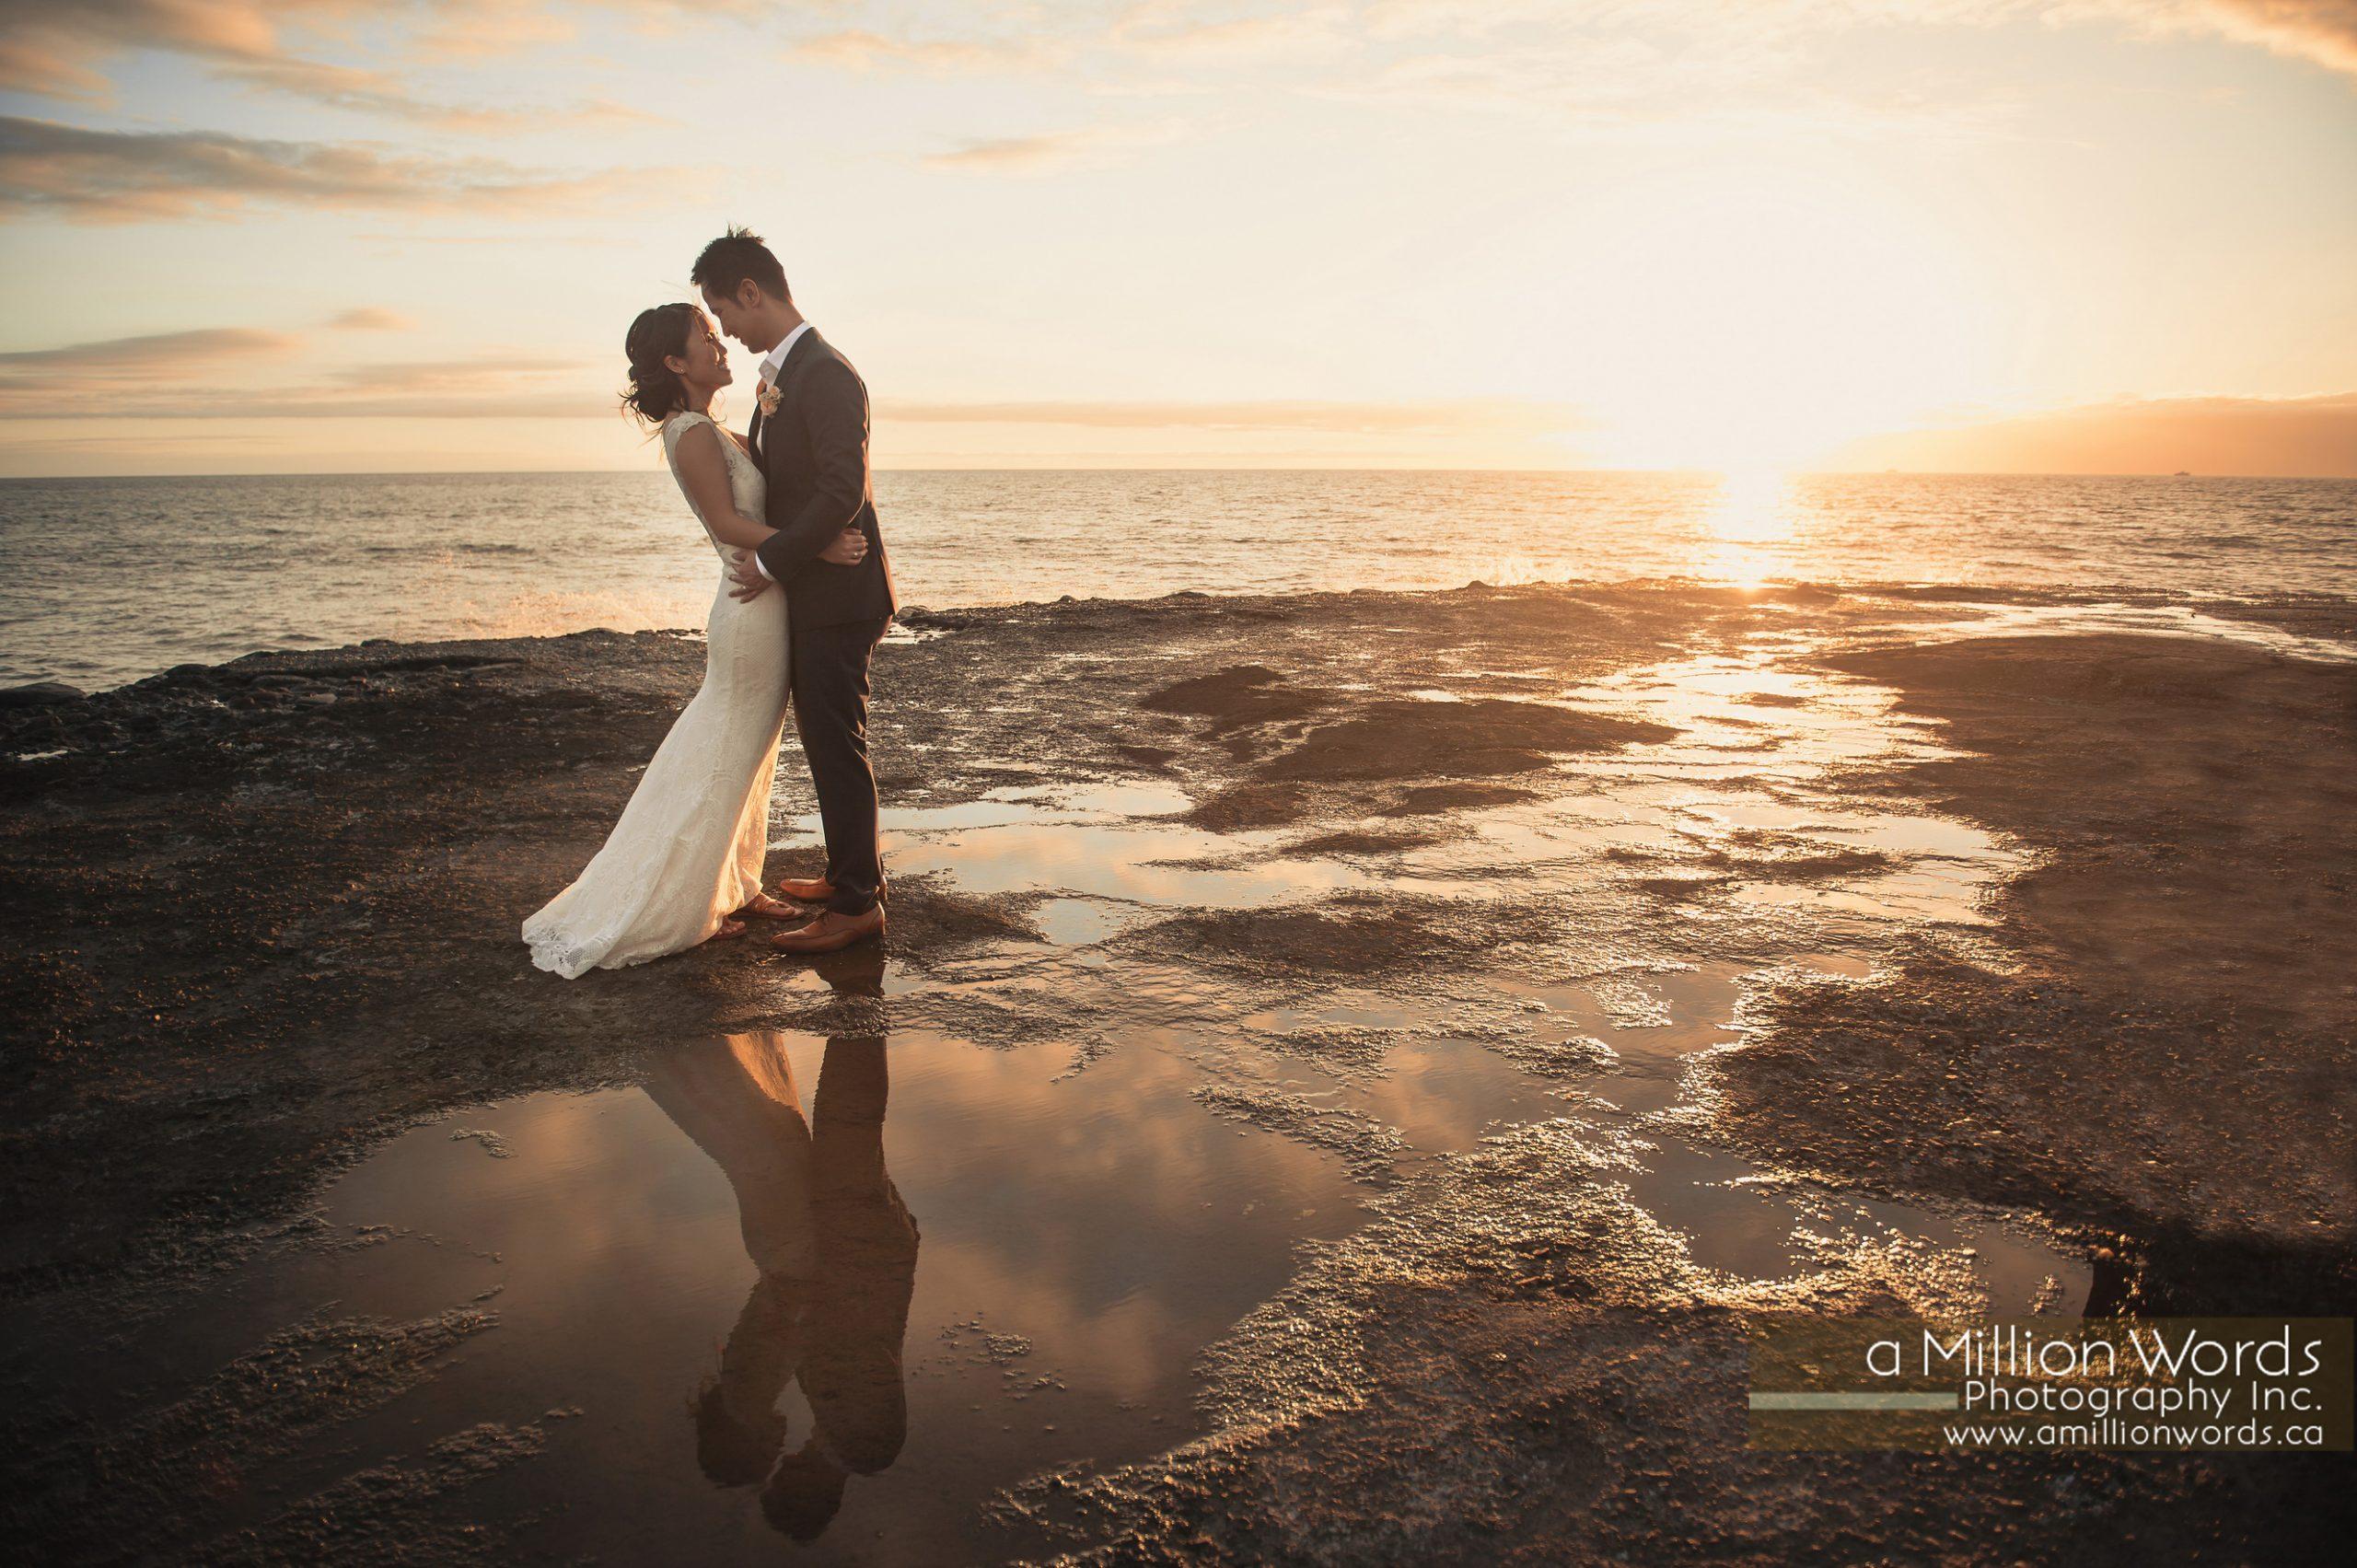 kw_destination_wedding_photography42